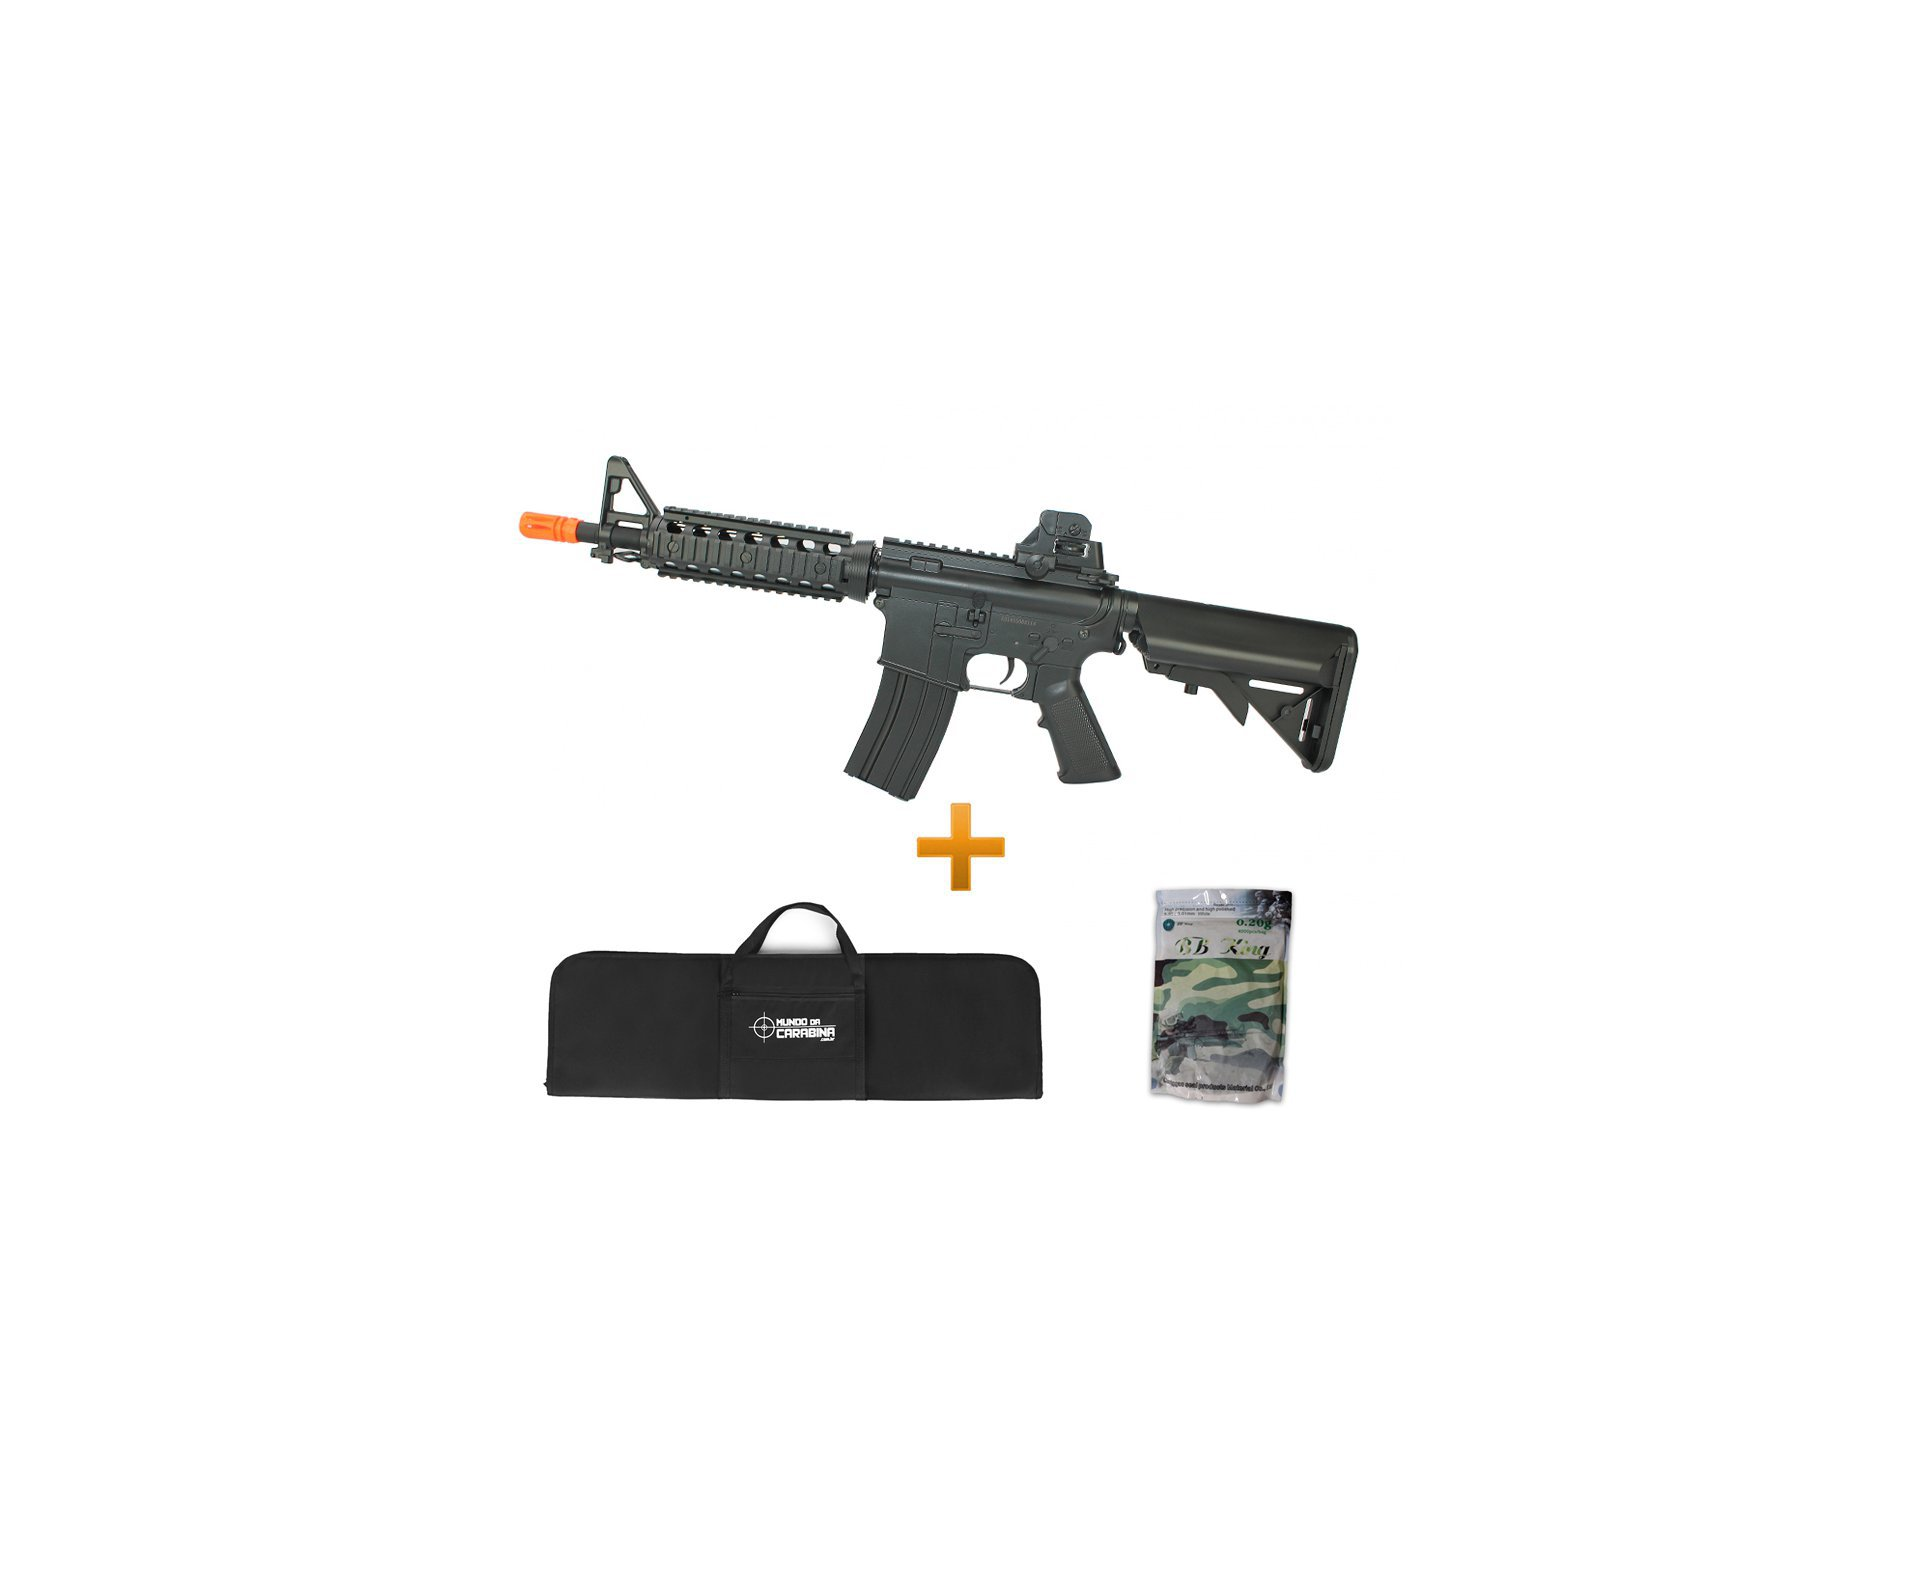 Rifle De Airsoft M4a1 Cqb Ris Cm506 Cal 6mm - Eletrico Bivolt + 4000 Esferas 0,20g + Capa - Cyma